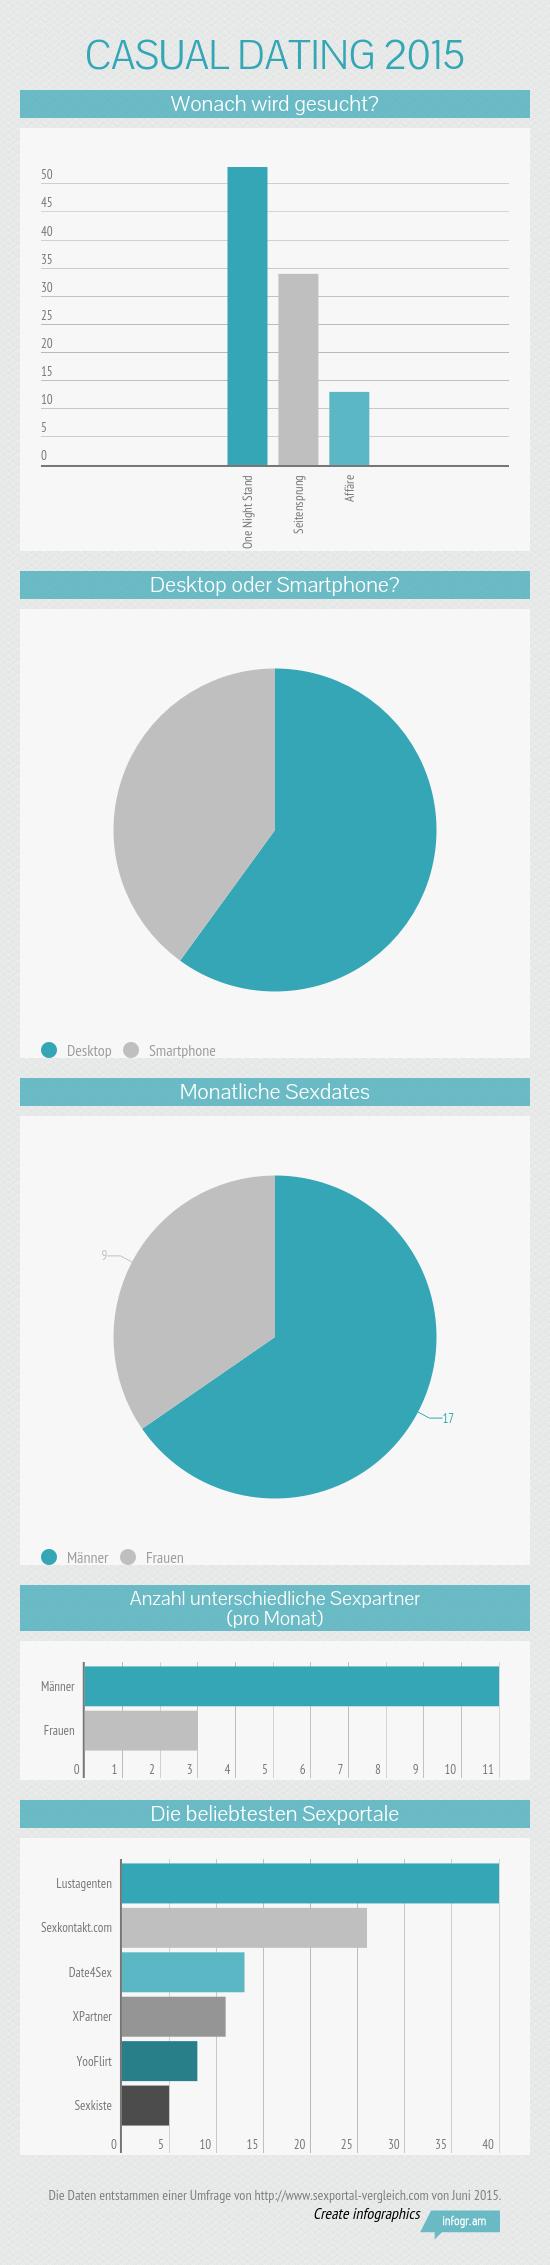 Infografik: Casual Dating im Jahre 2015